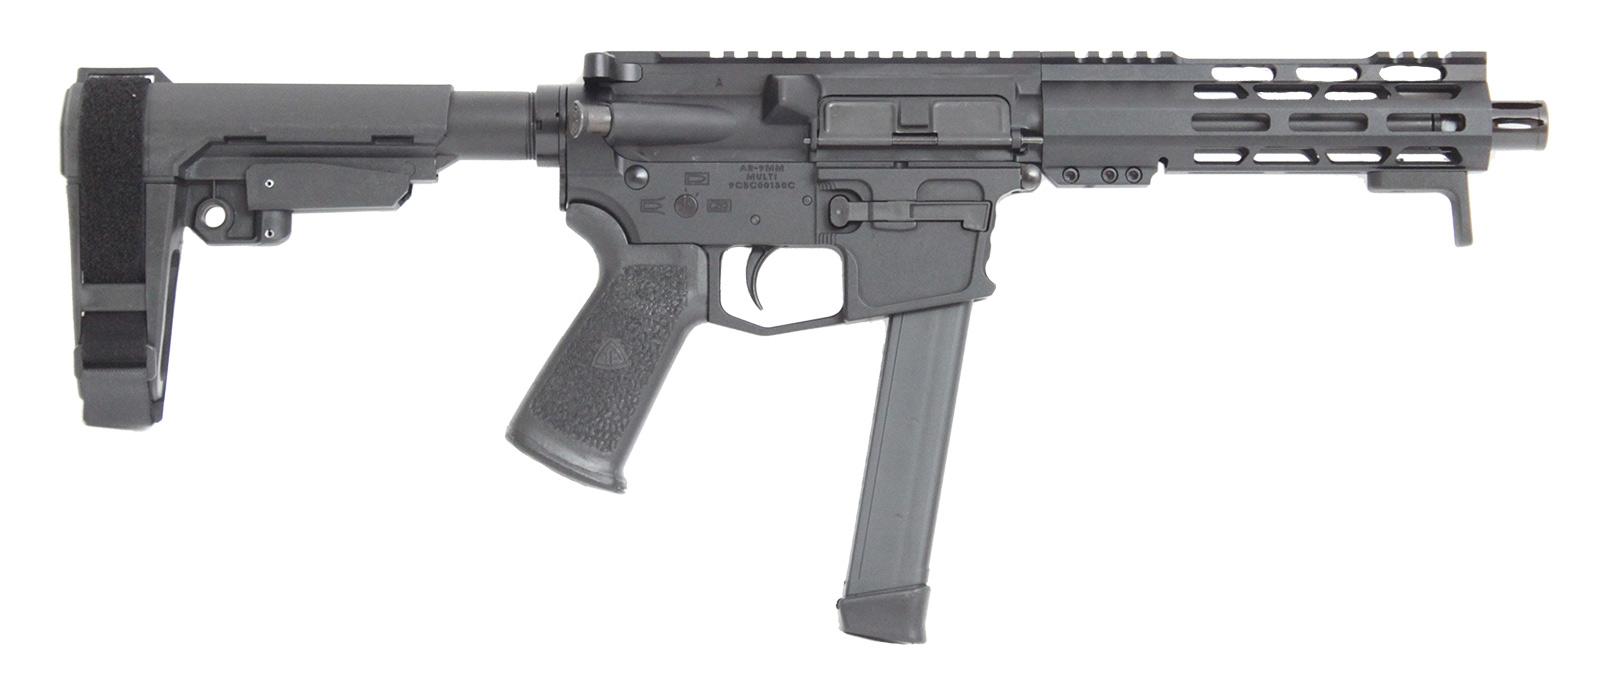 ar9-complete-pistol-7-5-inches-9mm-m-lok-non-lock-back-200231